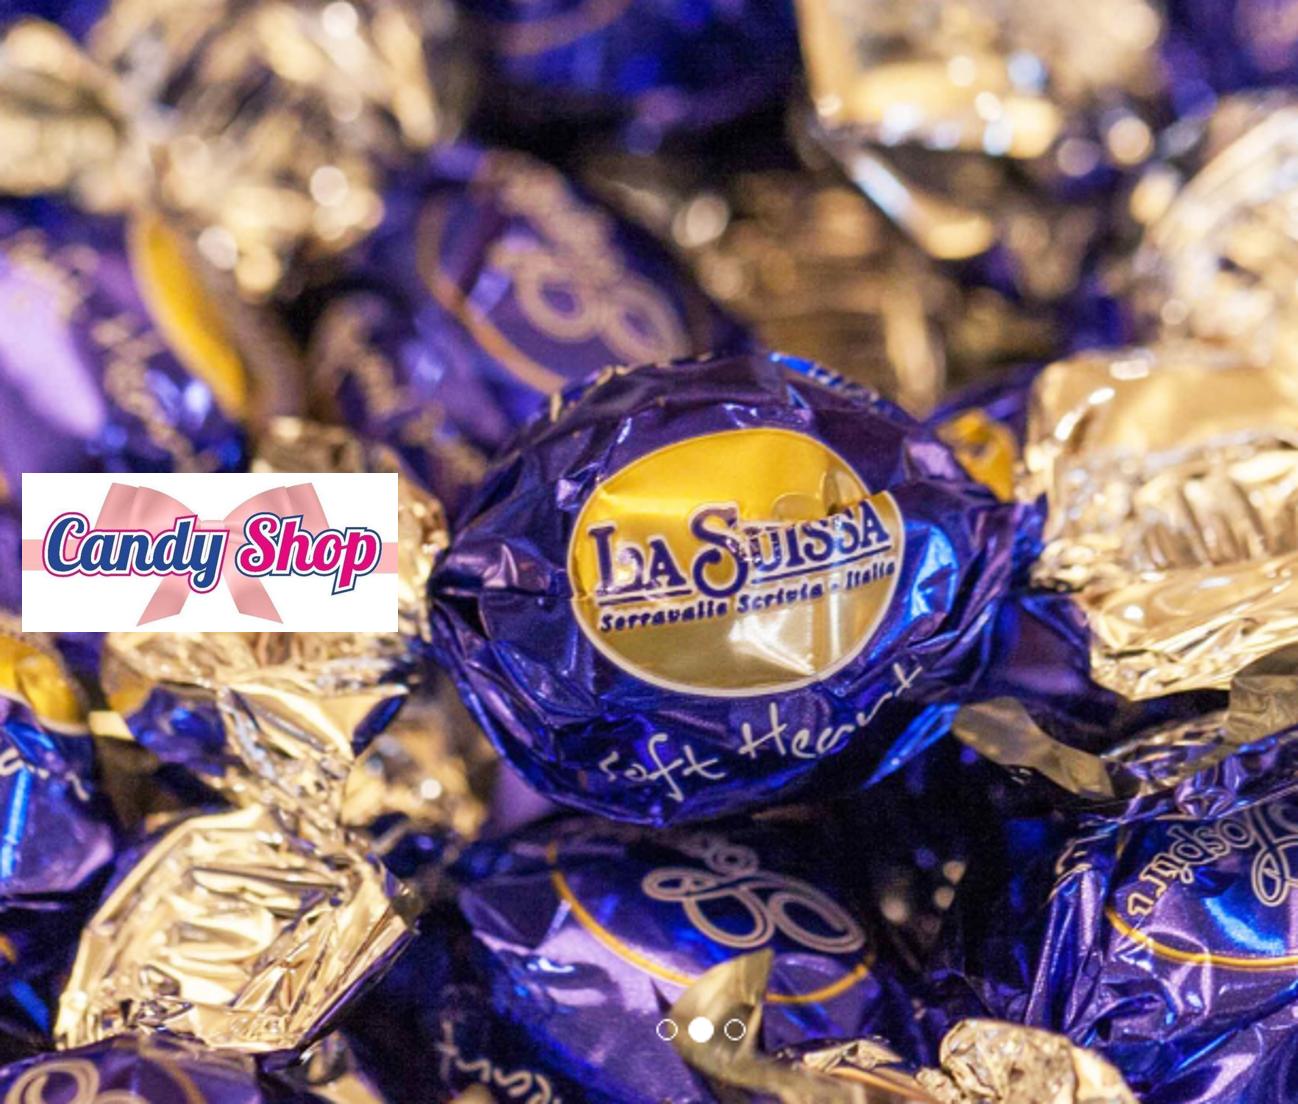 Cioccolato La Suissa - Candy Shop Torino